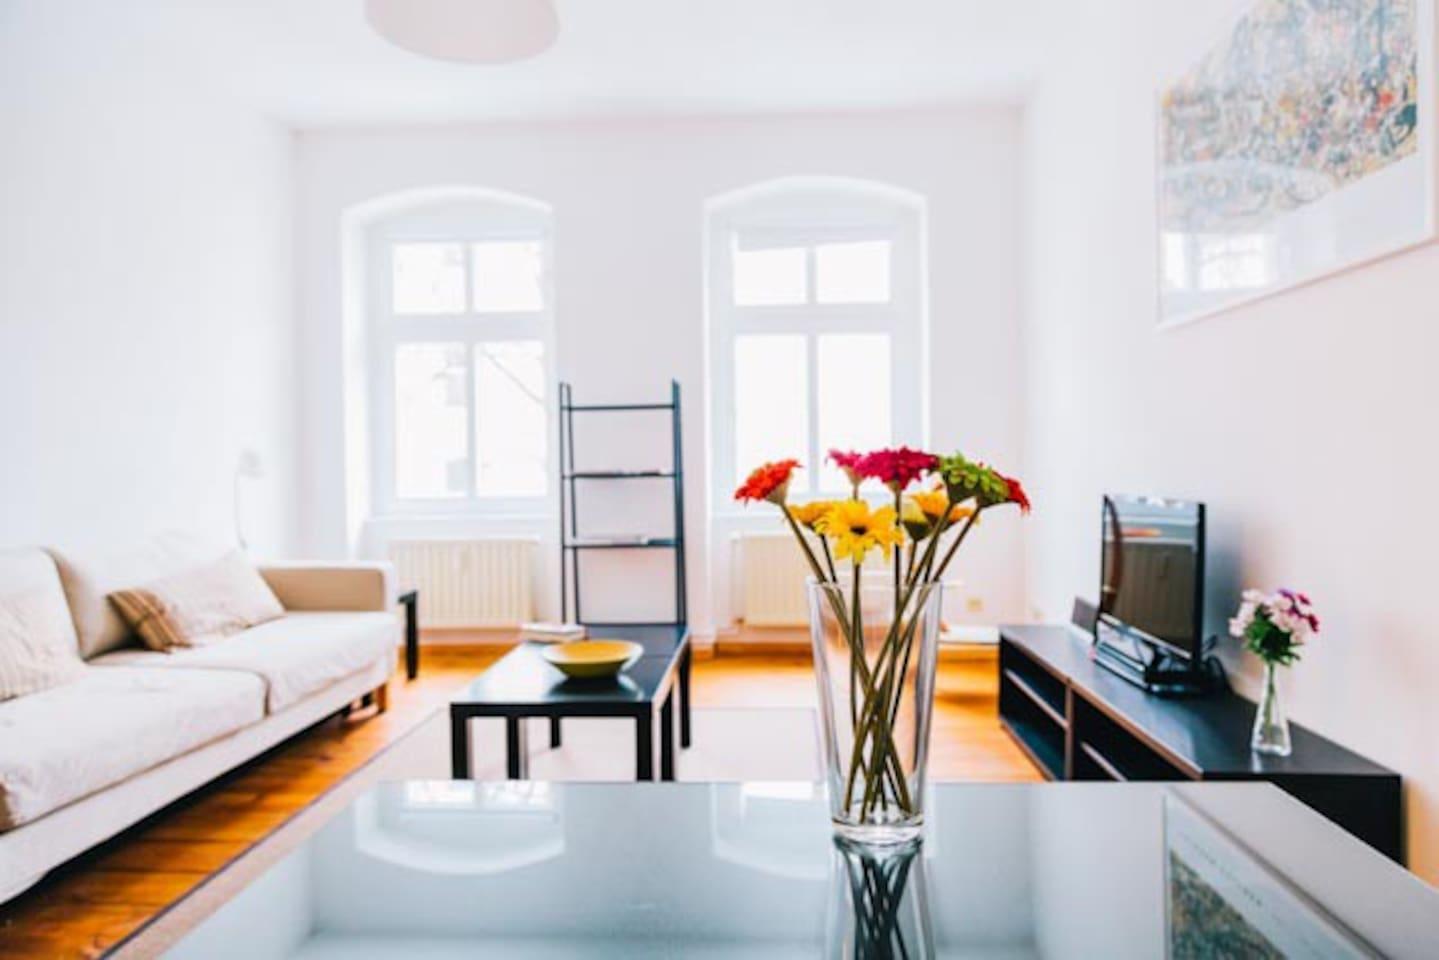 Charming Apartment in Prenzl Berg